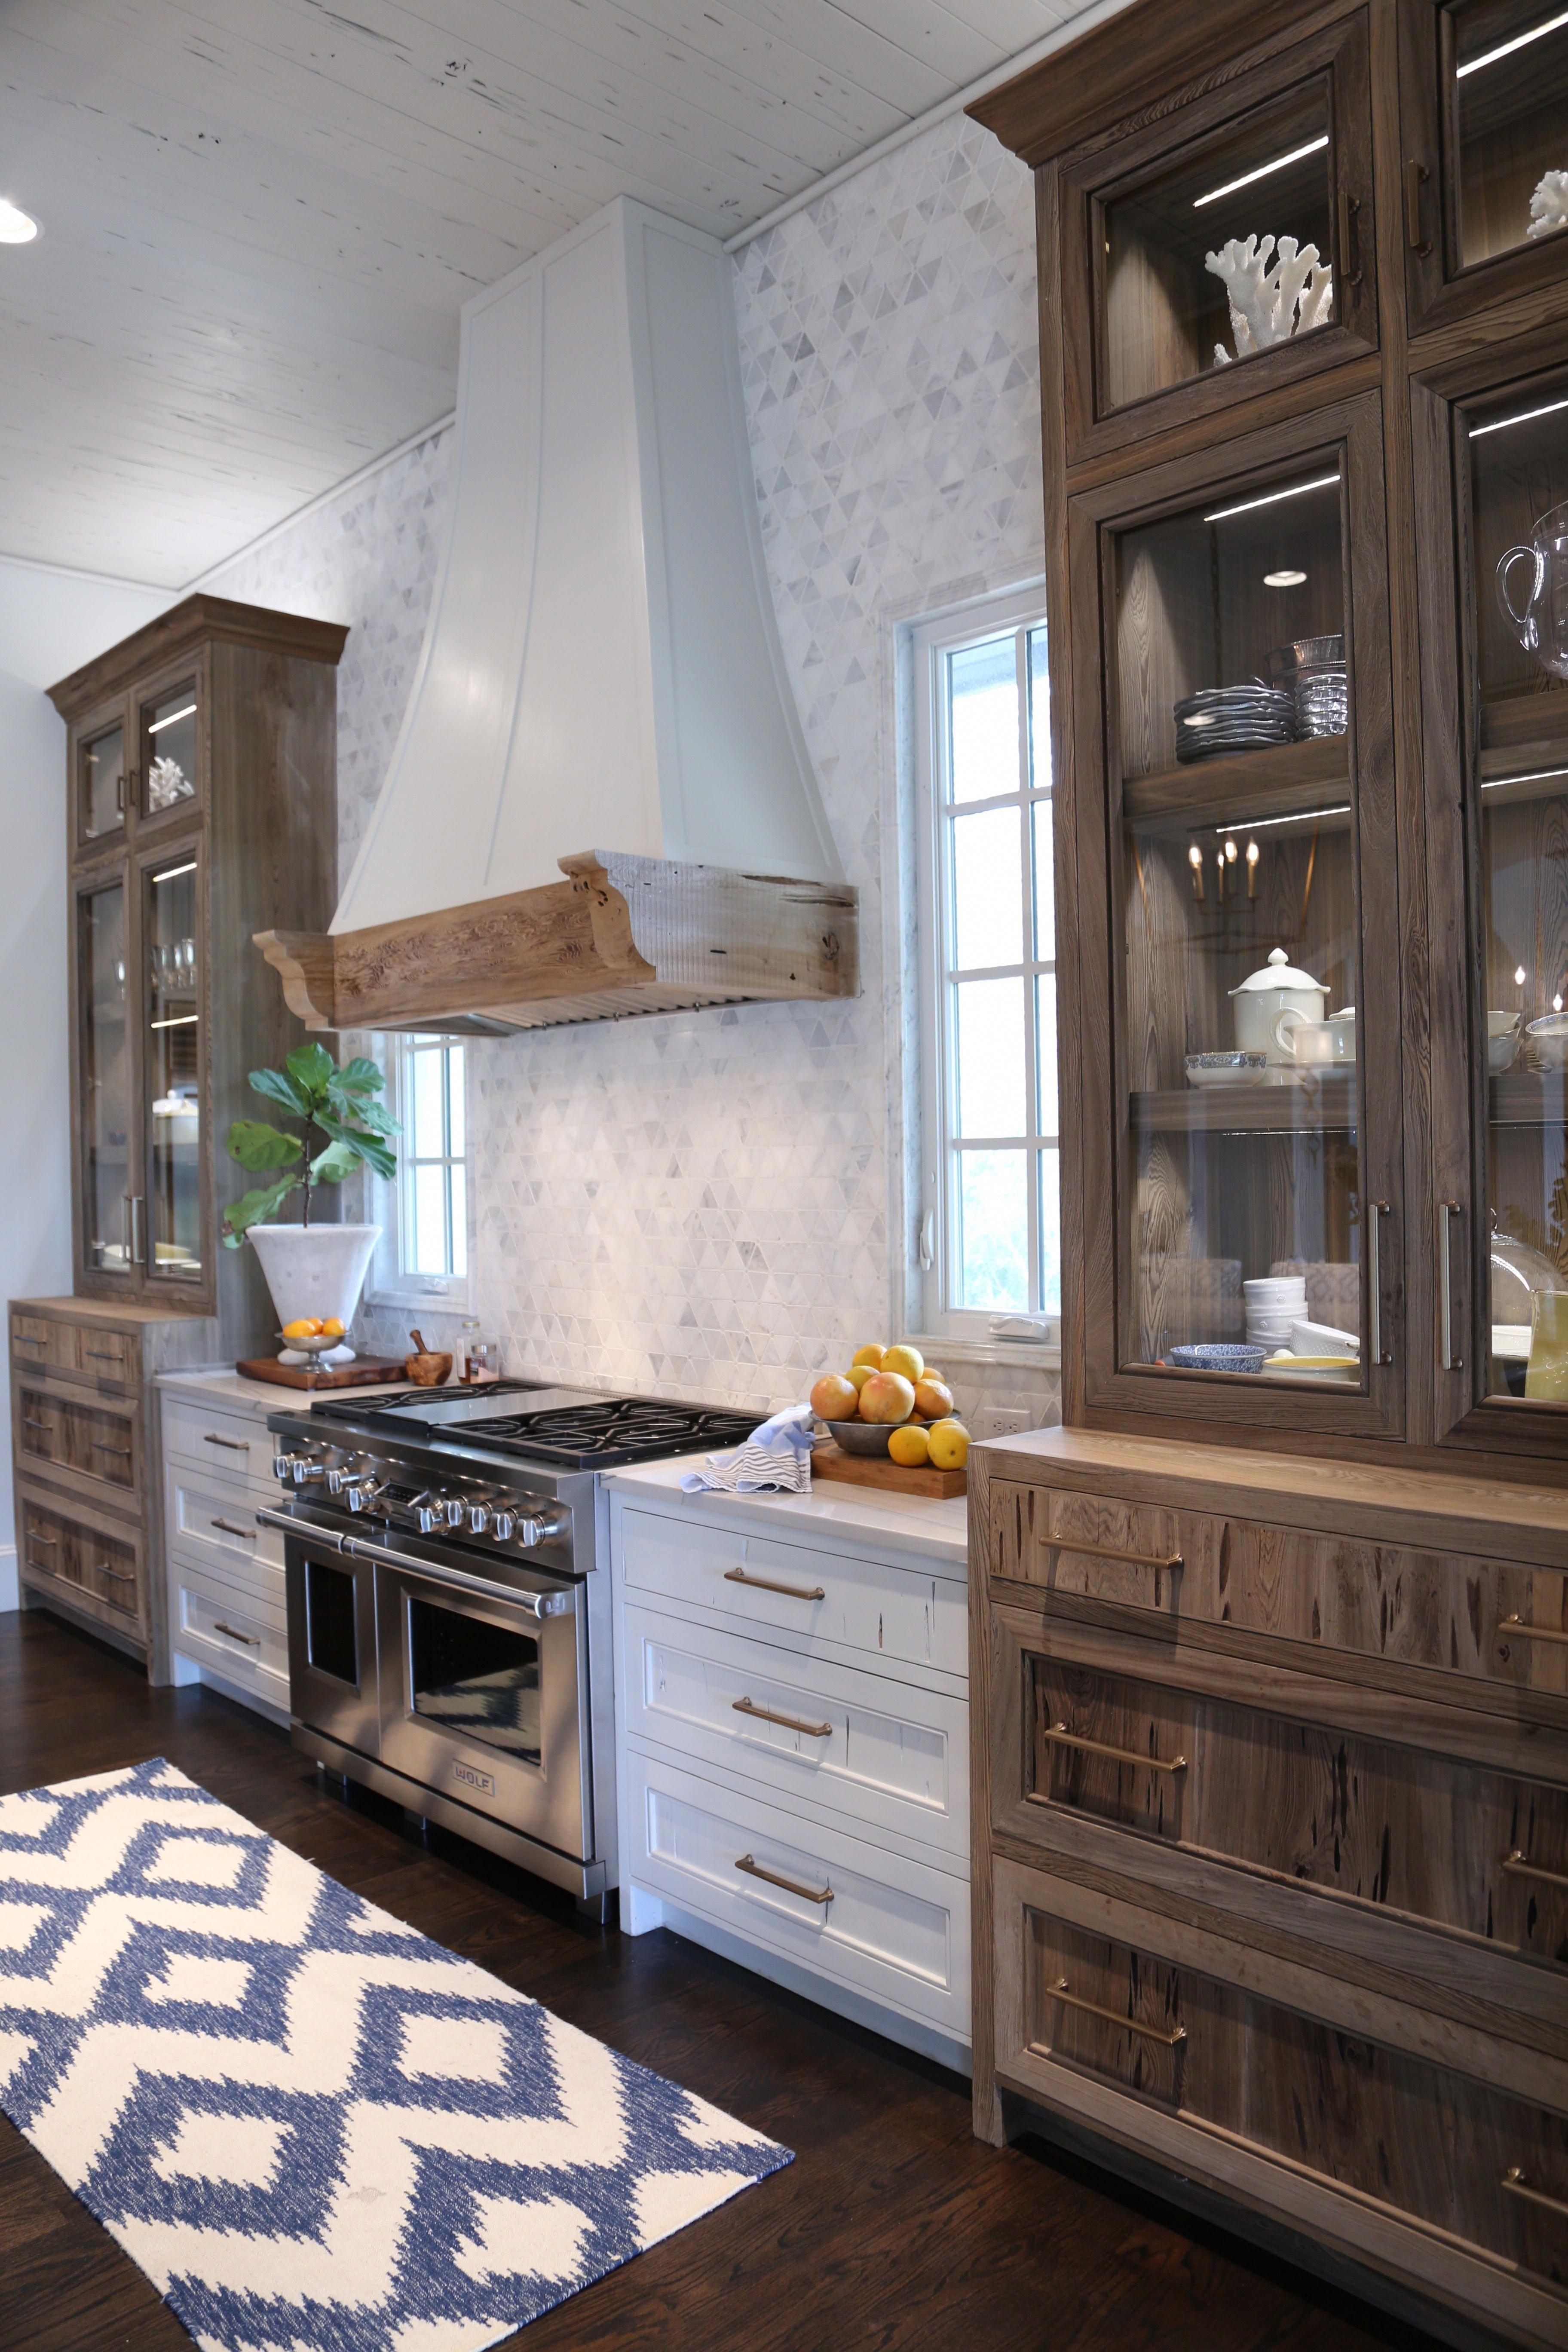 Hood with wood trim #kitcheninteriordesignwood   Interior ...